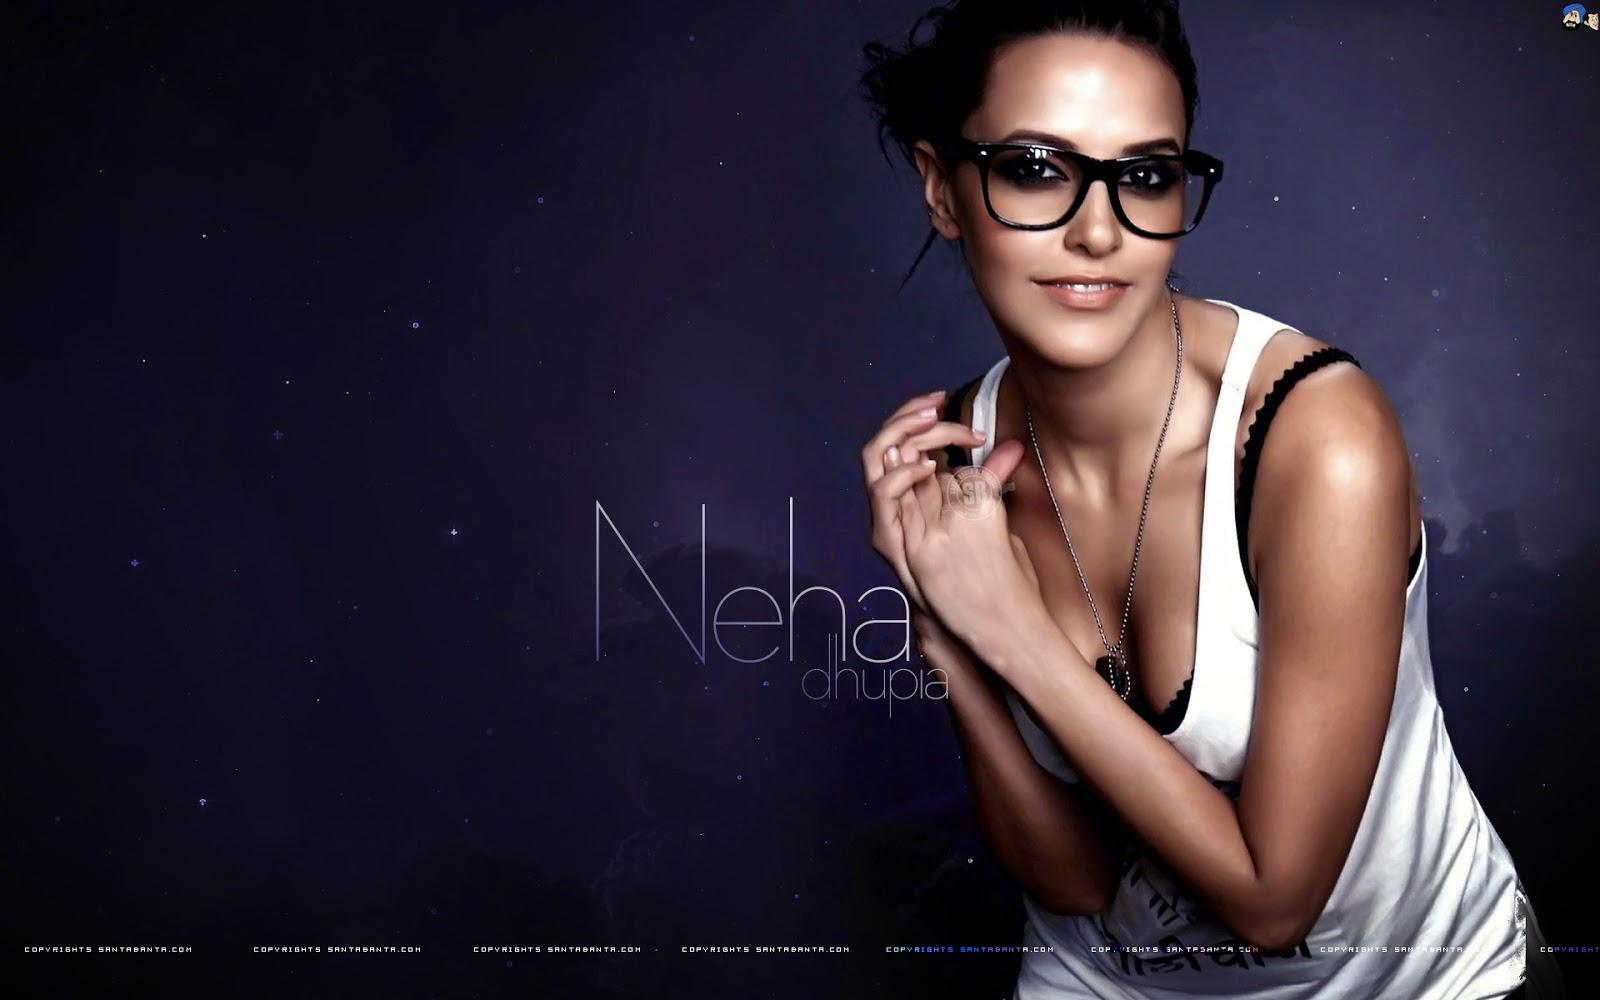 Koleksi Foto Neha Dhupia 12